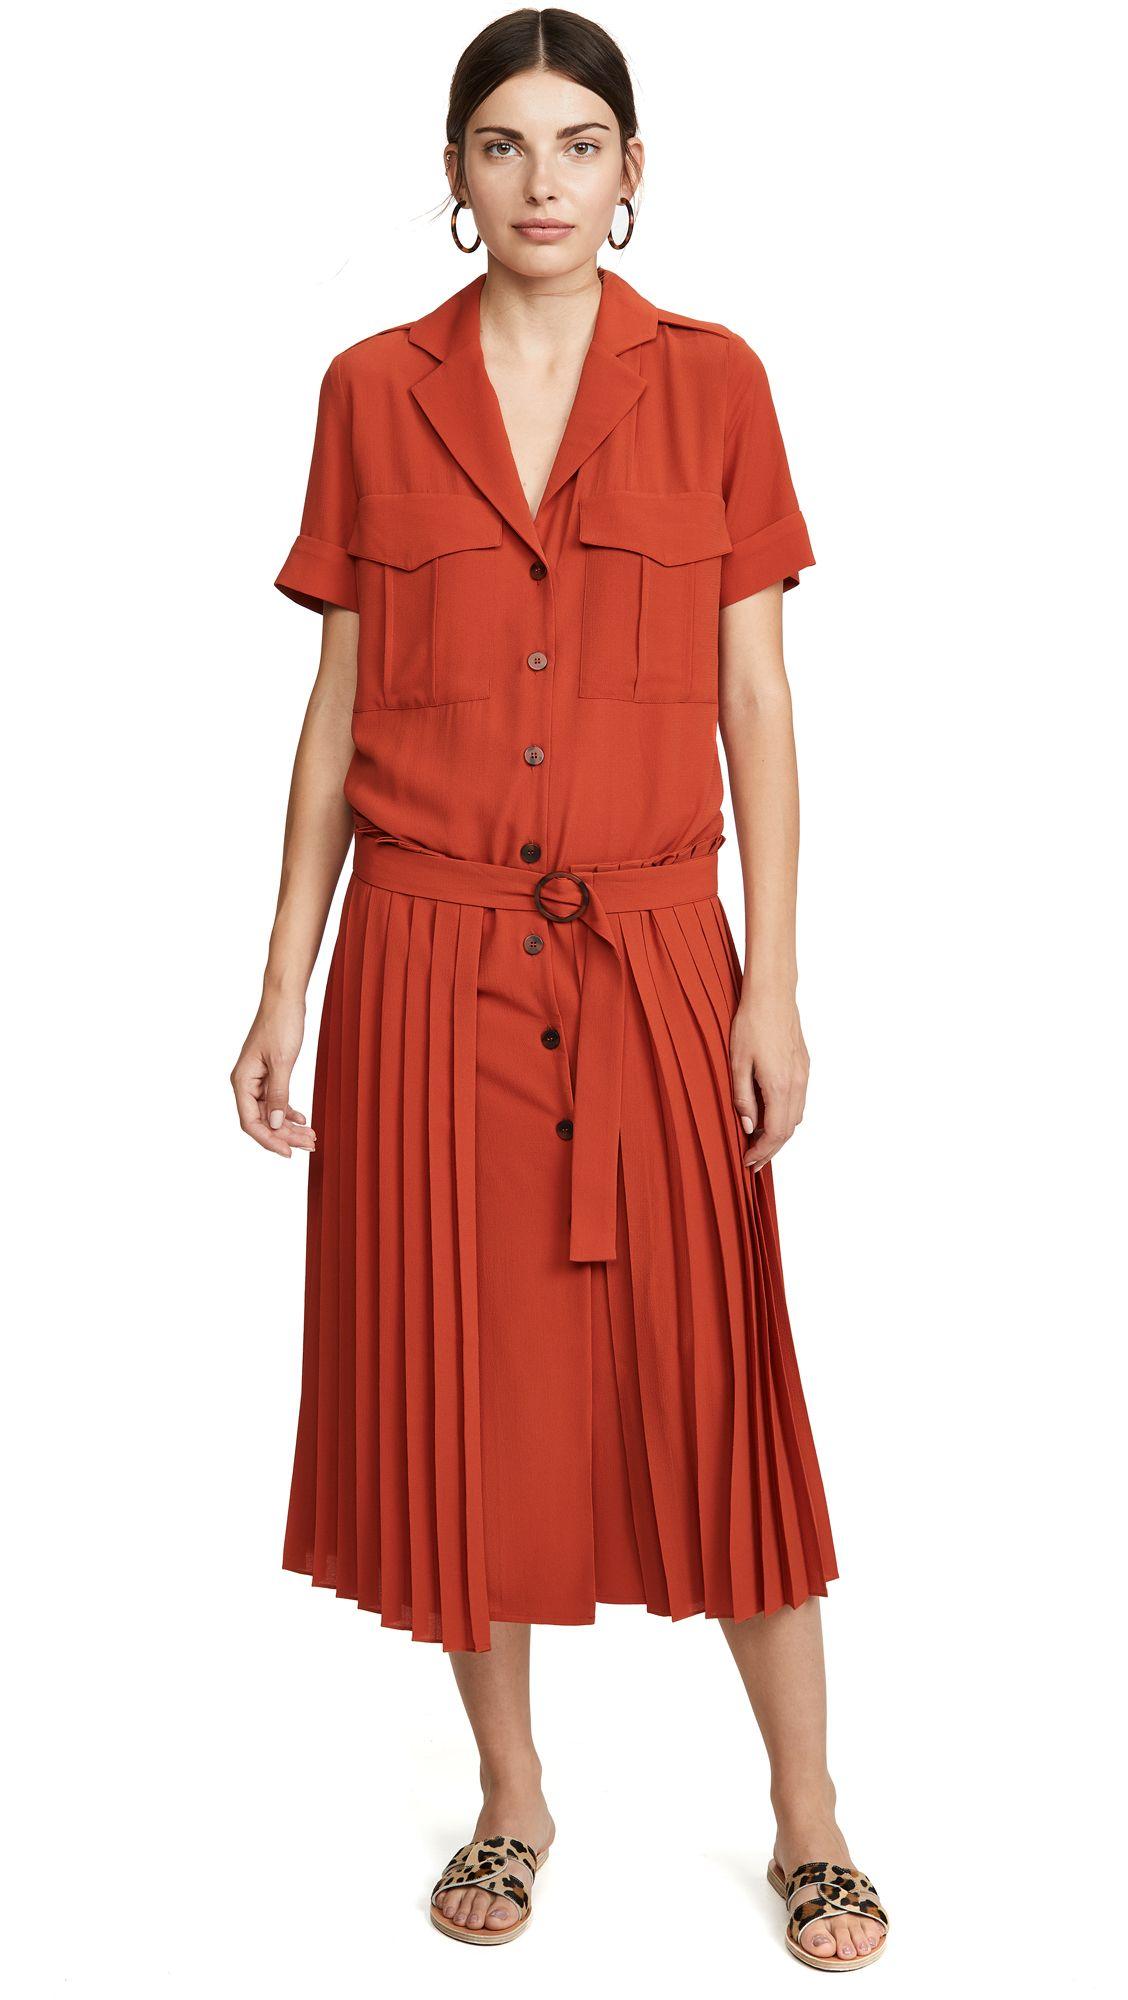 Victoria Victoria Beckham Pleat Detail Dress Shopbop Pleated Midi Skirt Dress Details Dresses [ 2000 x 1128 Pixel ]